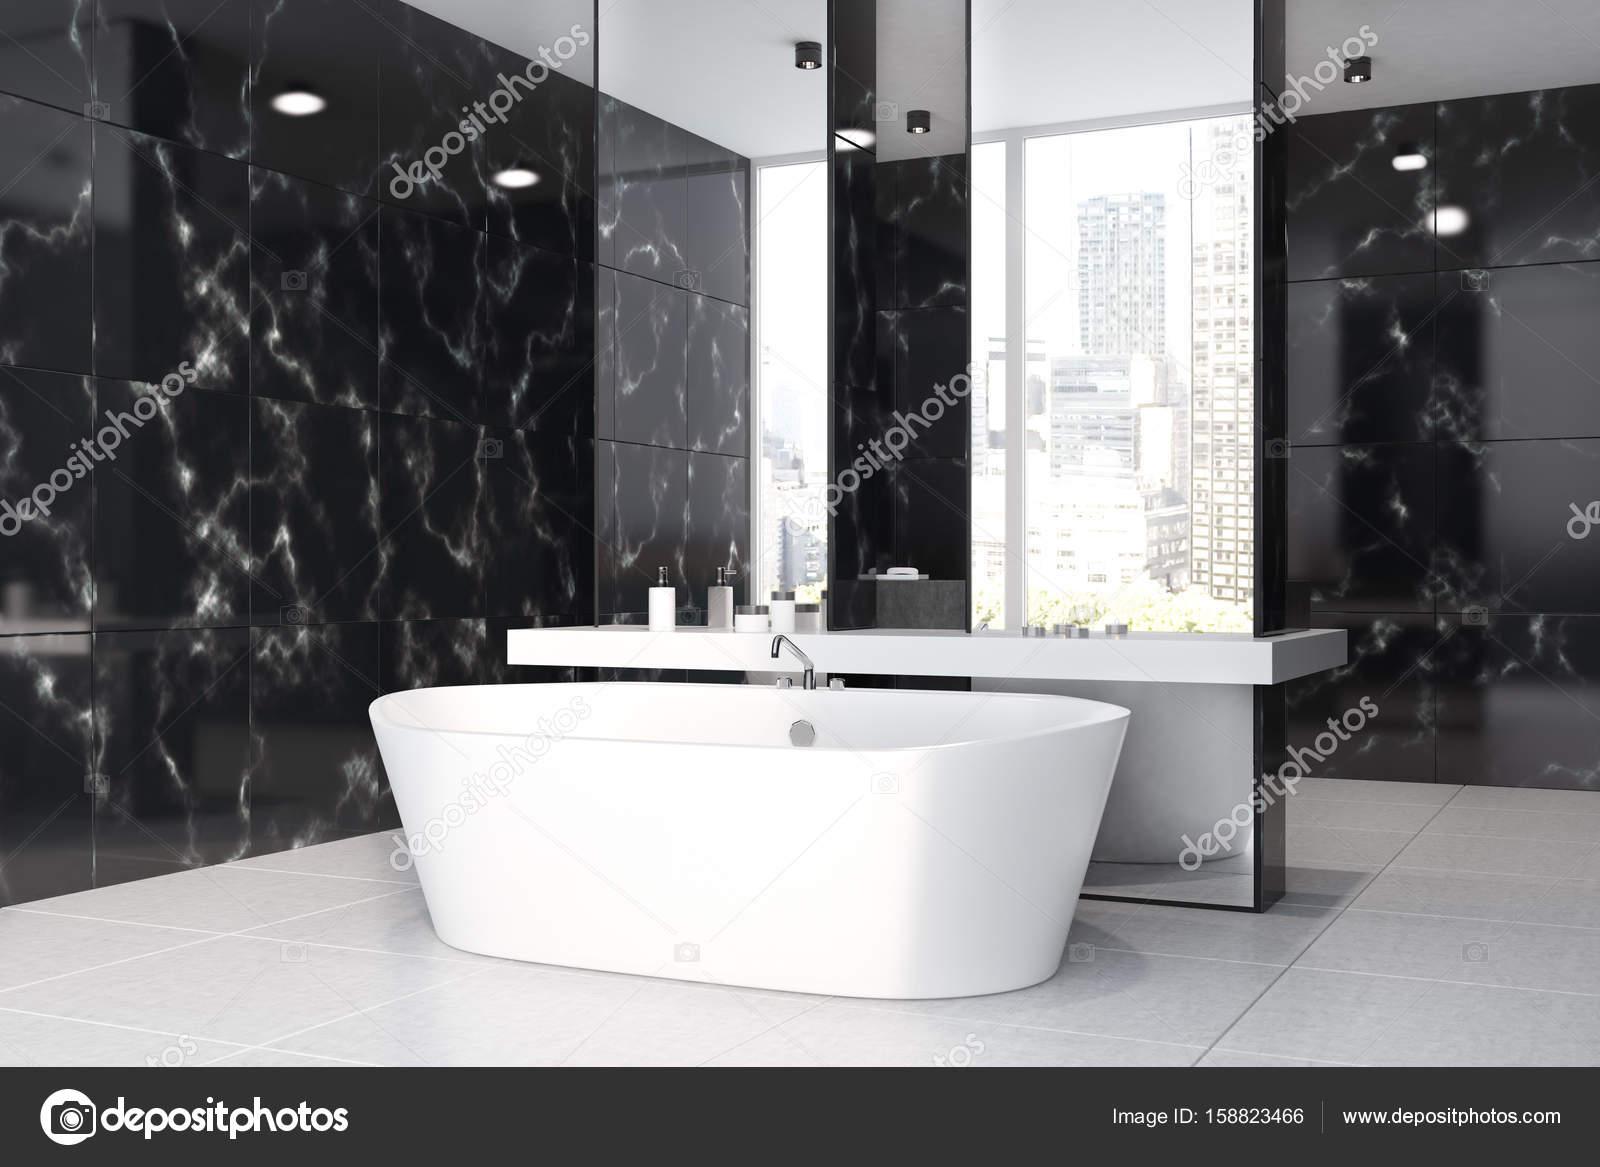 Black Marble Bathroom Sink Tub Side Stock Photo